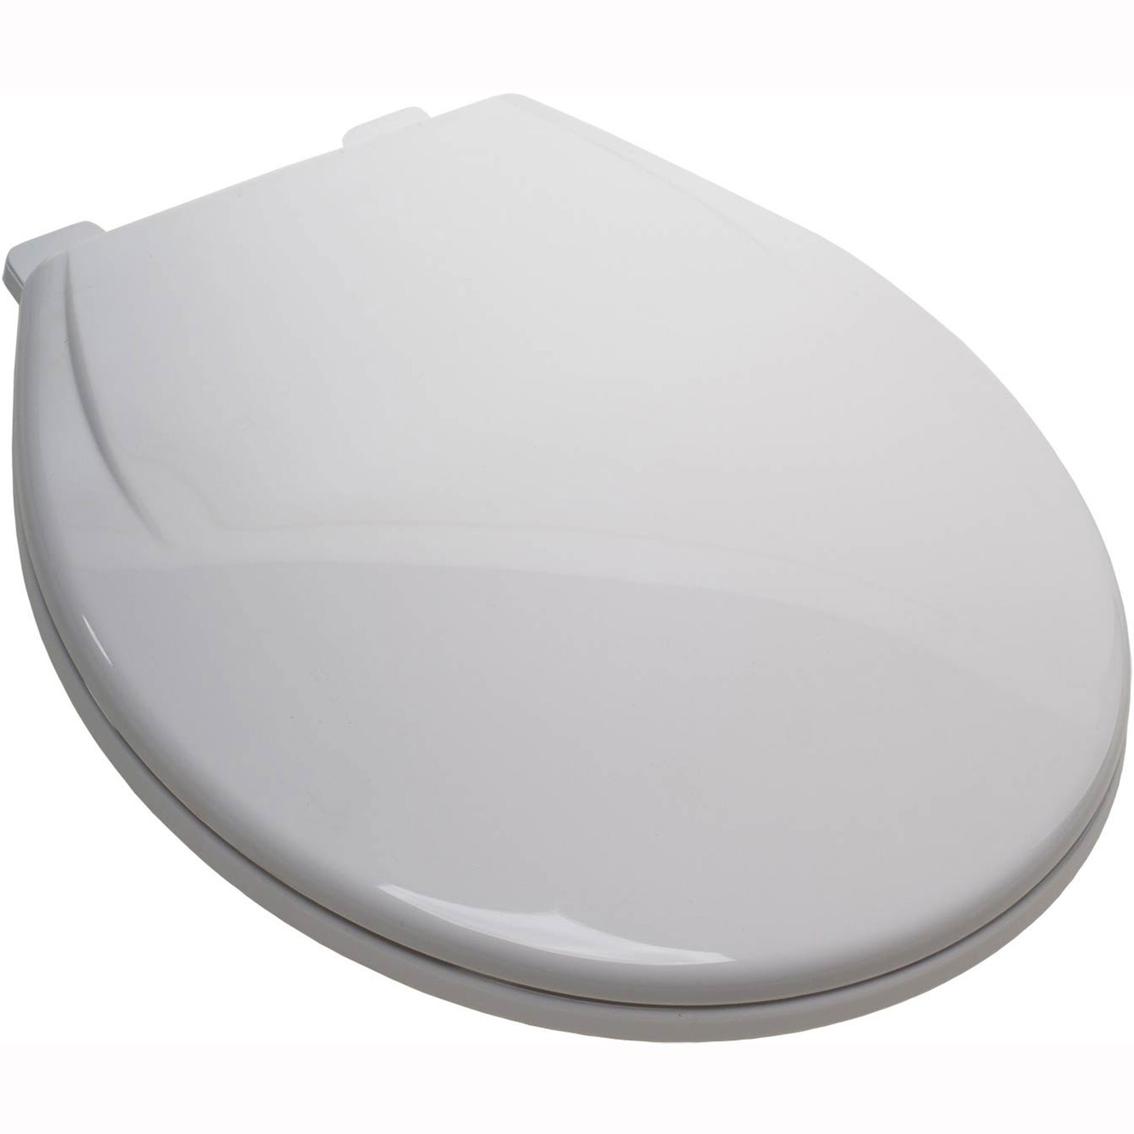 Comfort Seats Ez Close Toilet Seat | Tub & Shower Accessories | Home ...